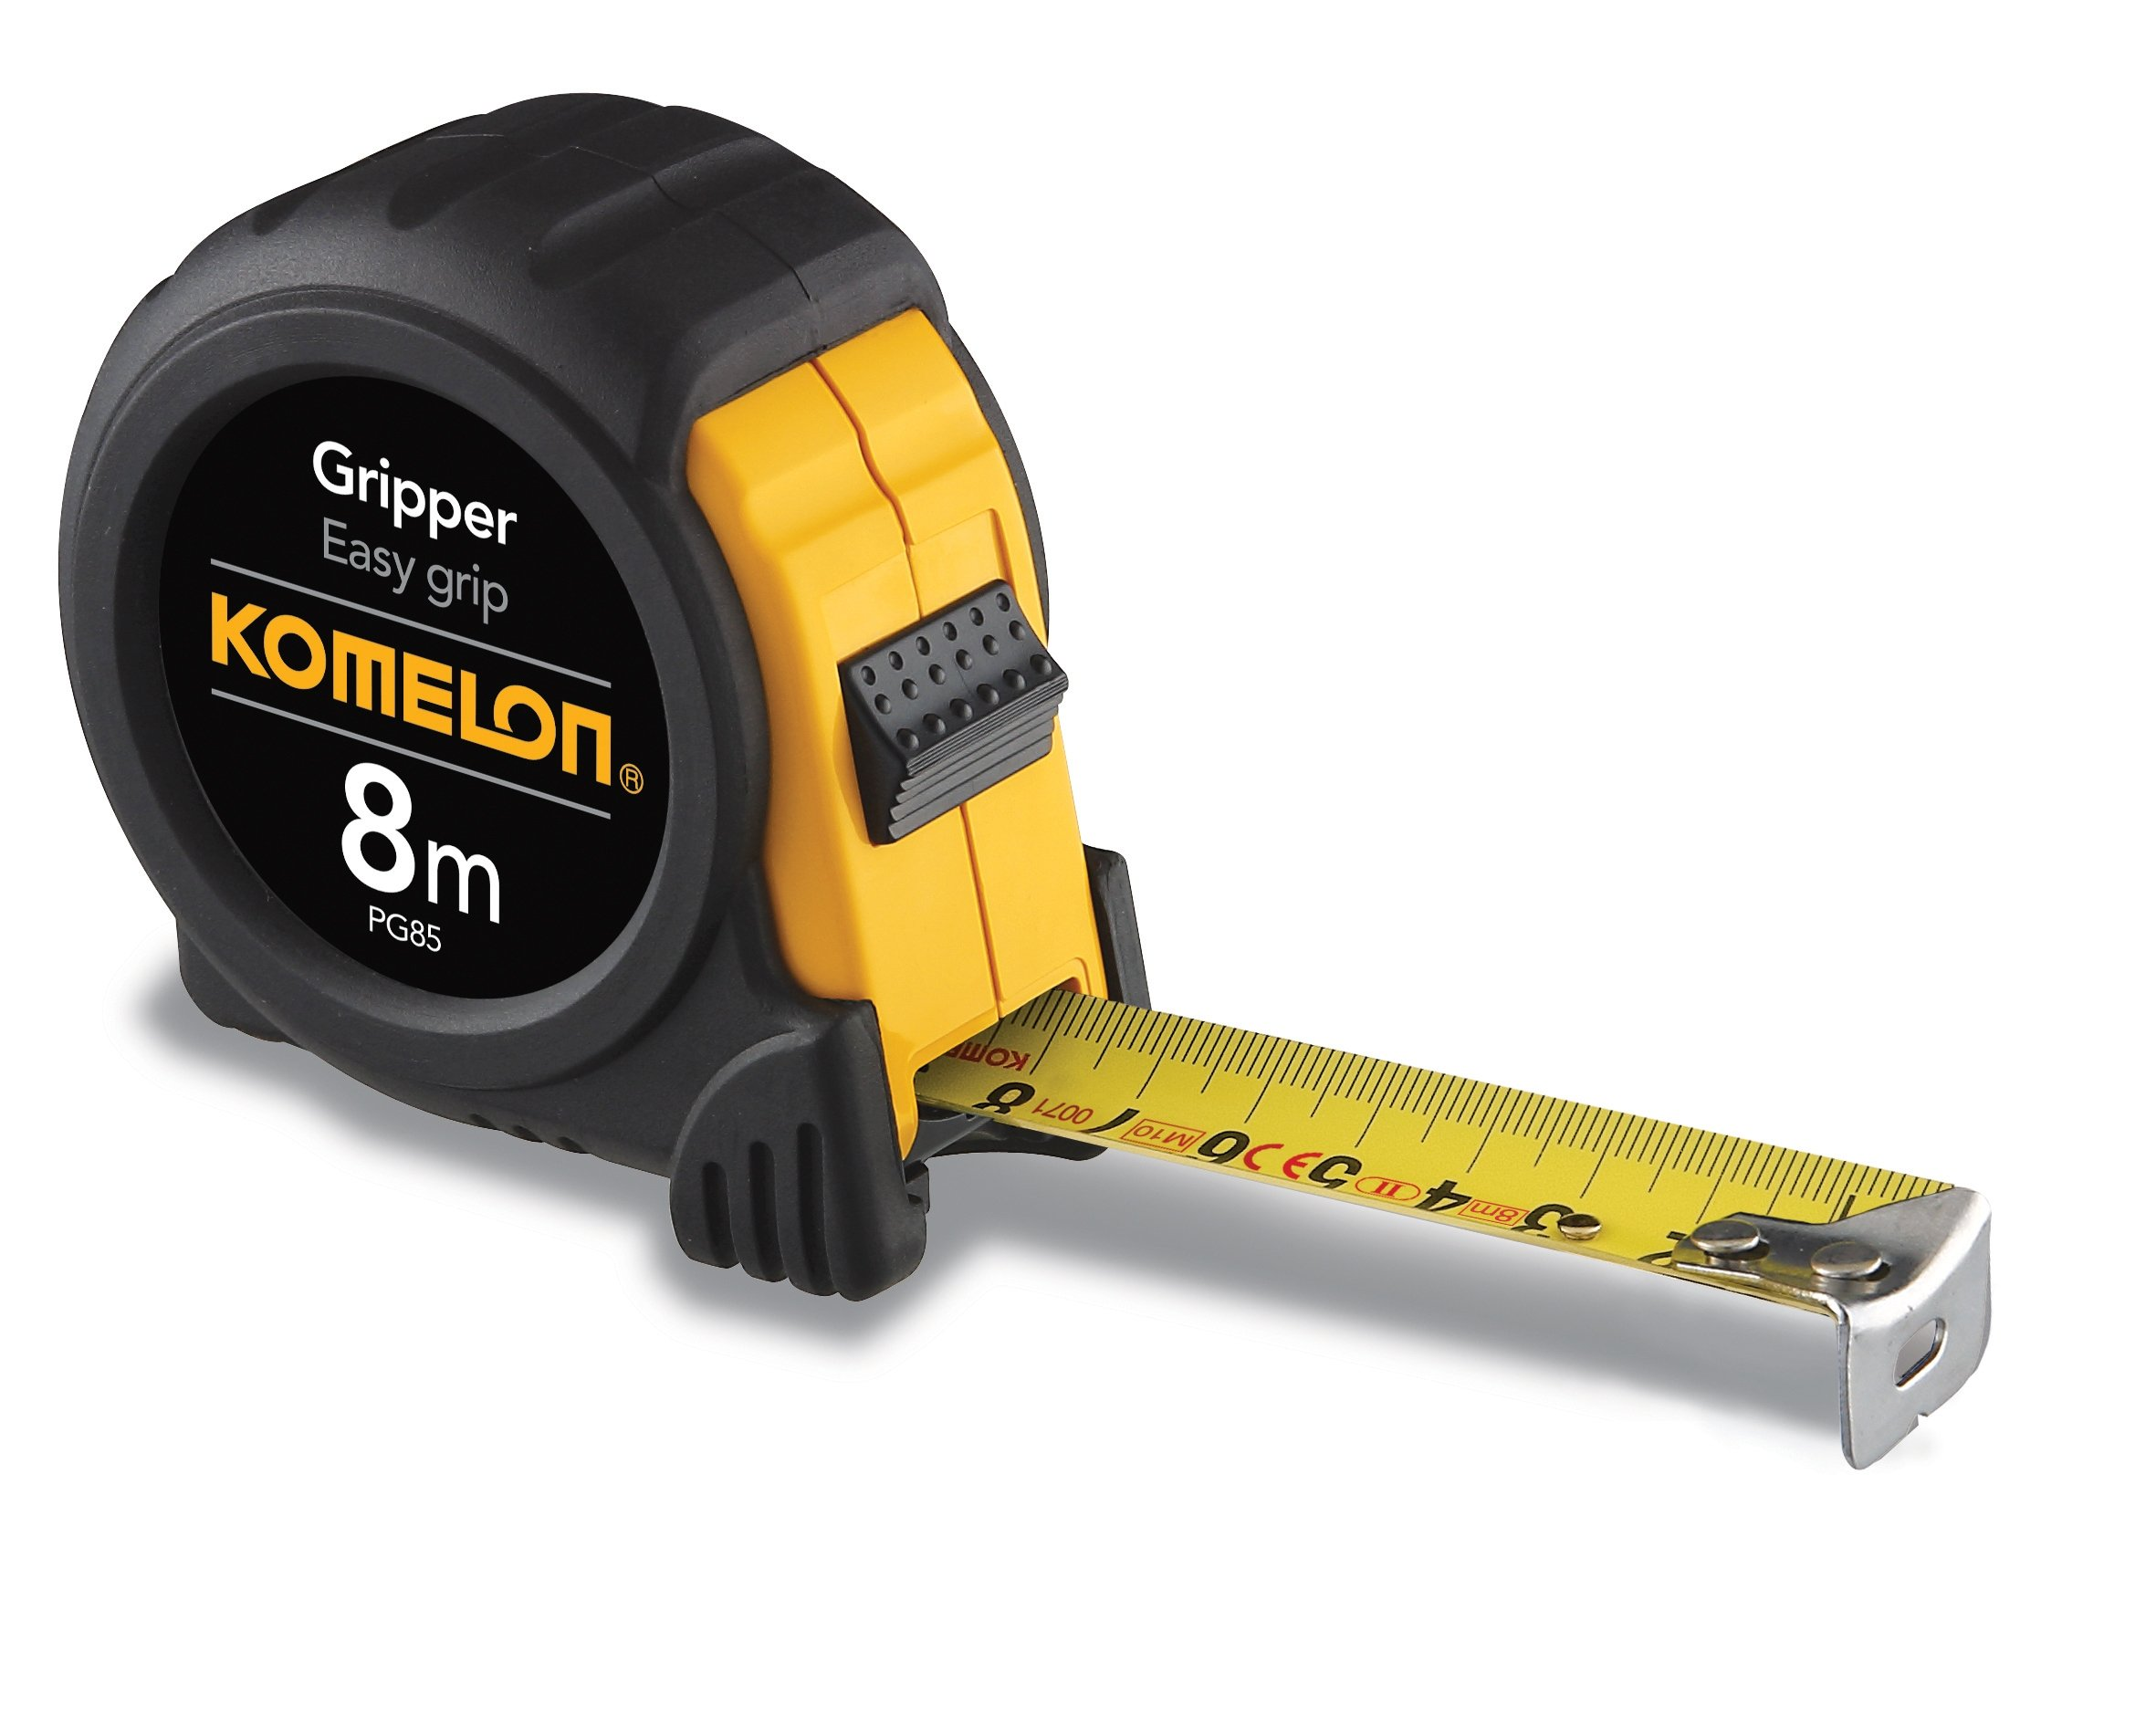 Komelon PG85 8m by 25mm Metric Gripper Tape, Black by Komelon